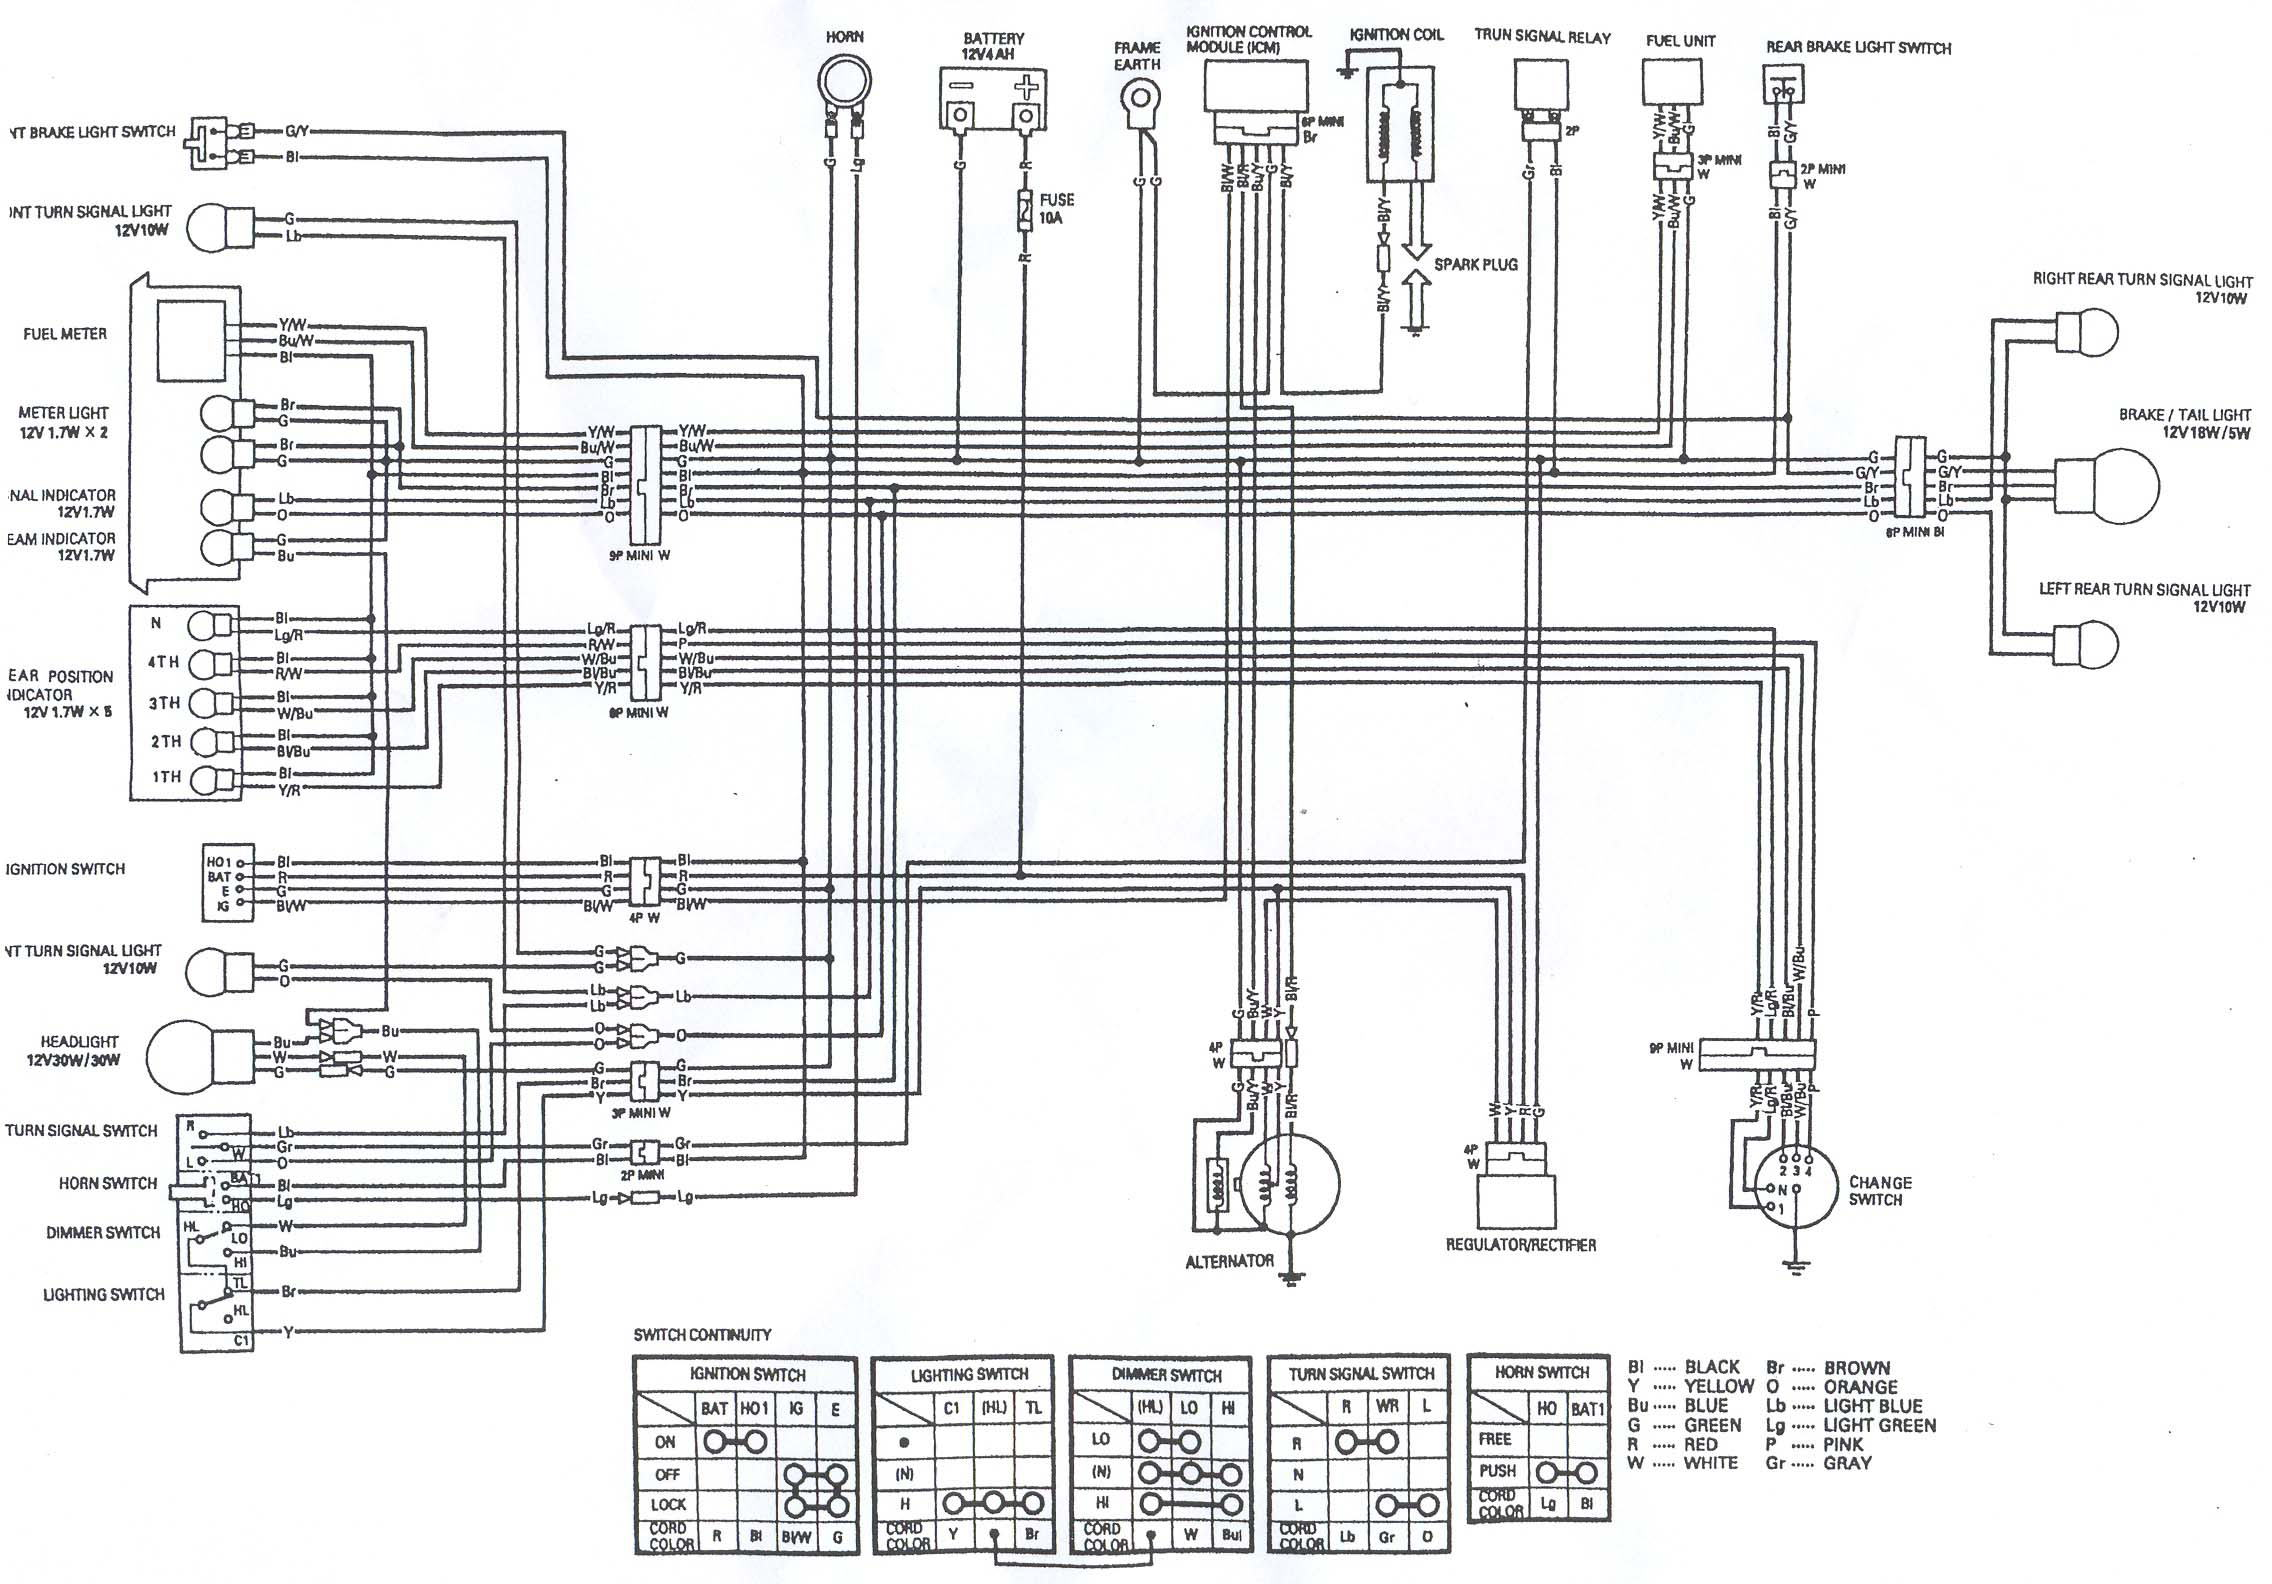 1970 honda sl350 wiring diagram honda xl70 wiring diagram